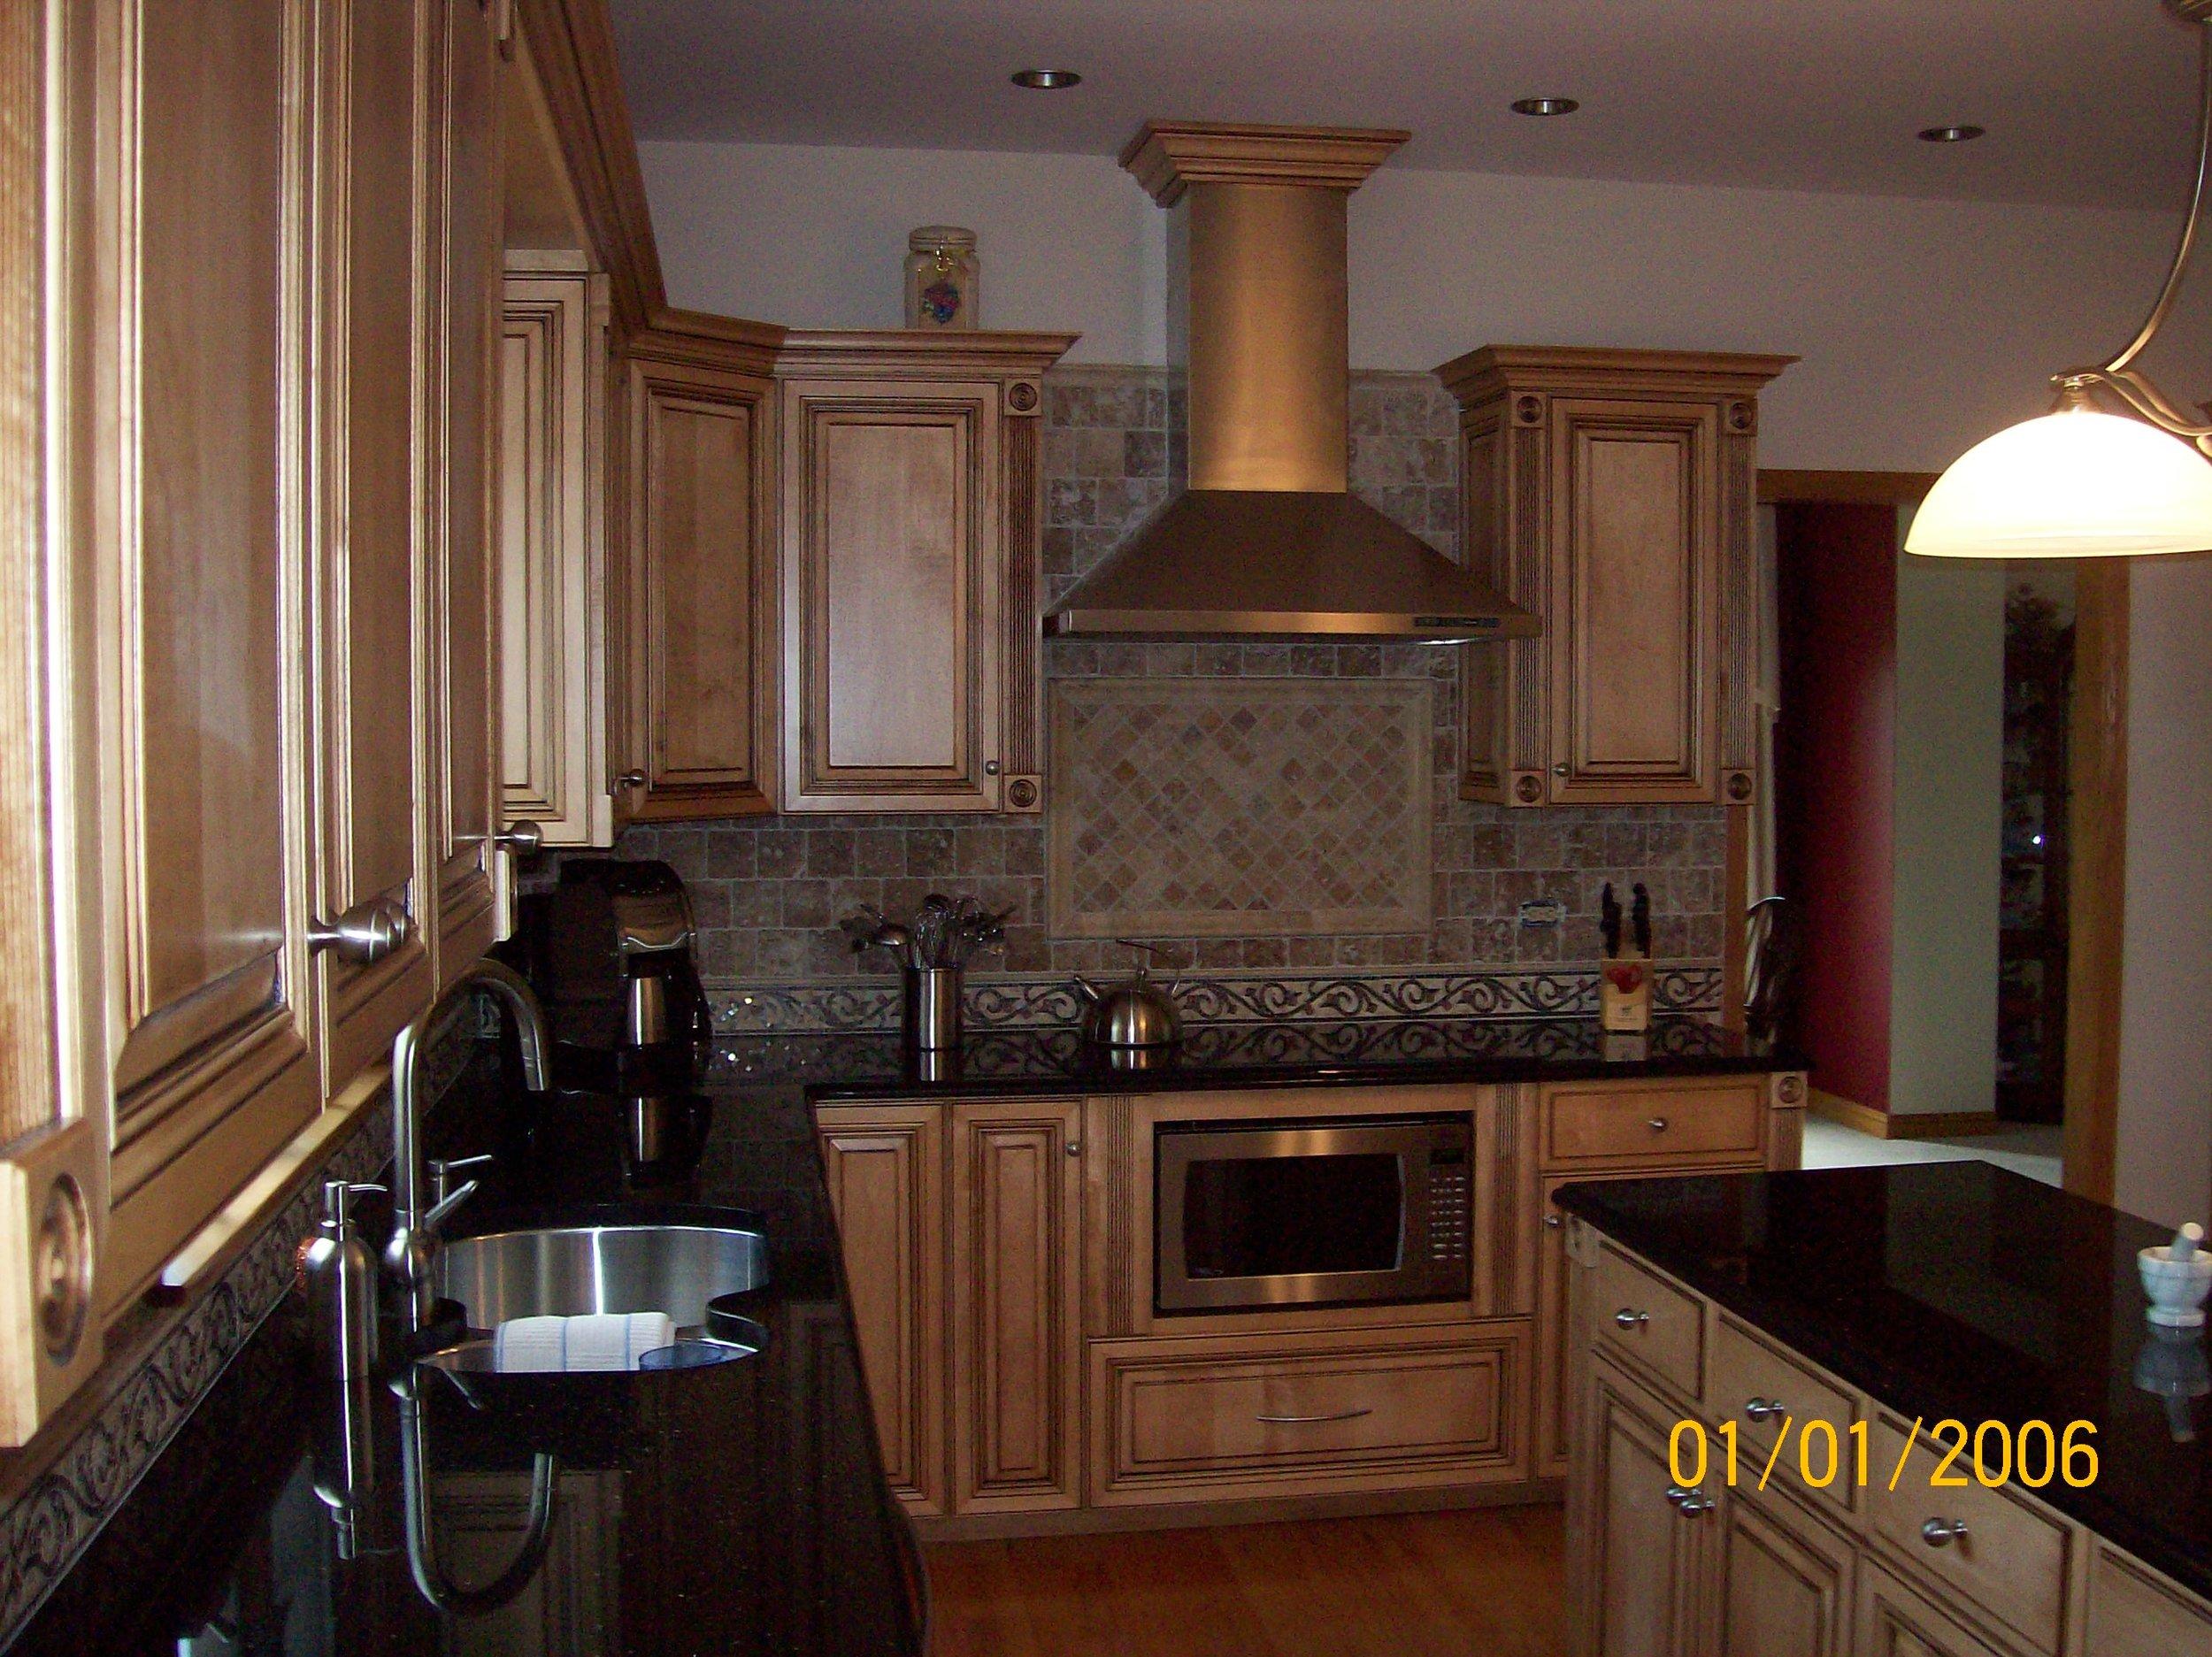 Talladega and Kitchens 011.jpg